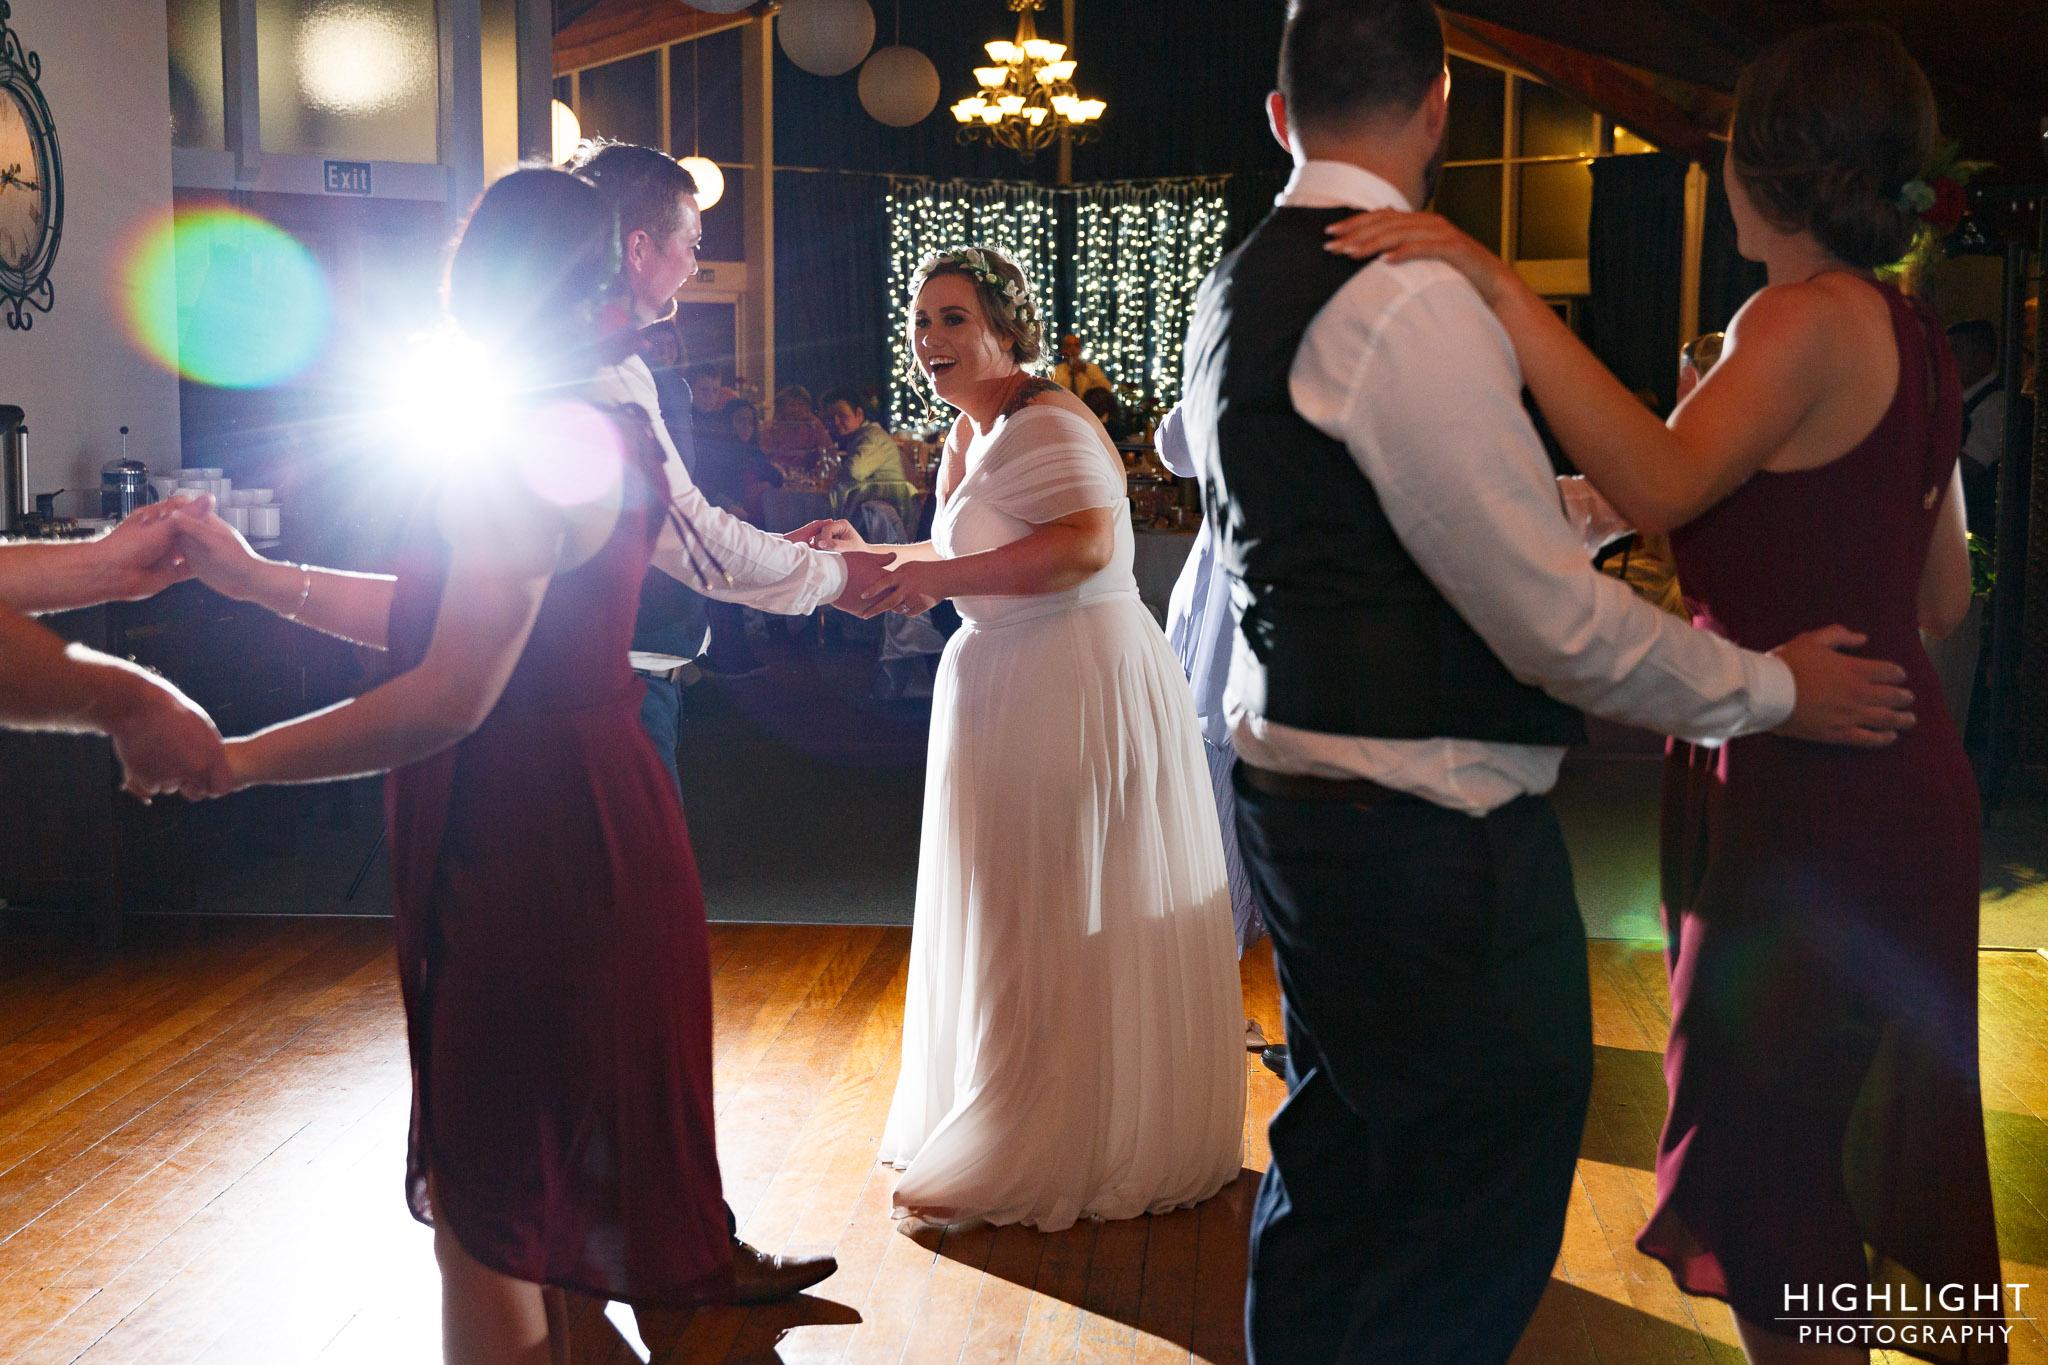 Highlight-wedding-photography-new-zealand-palmerston-north-136.jpg